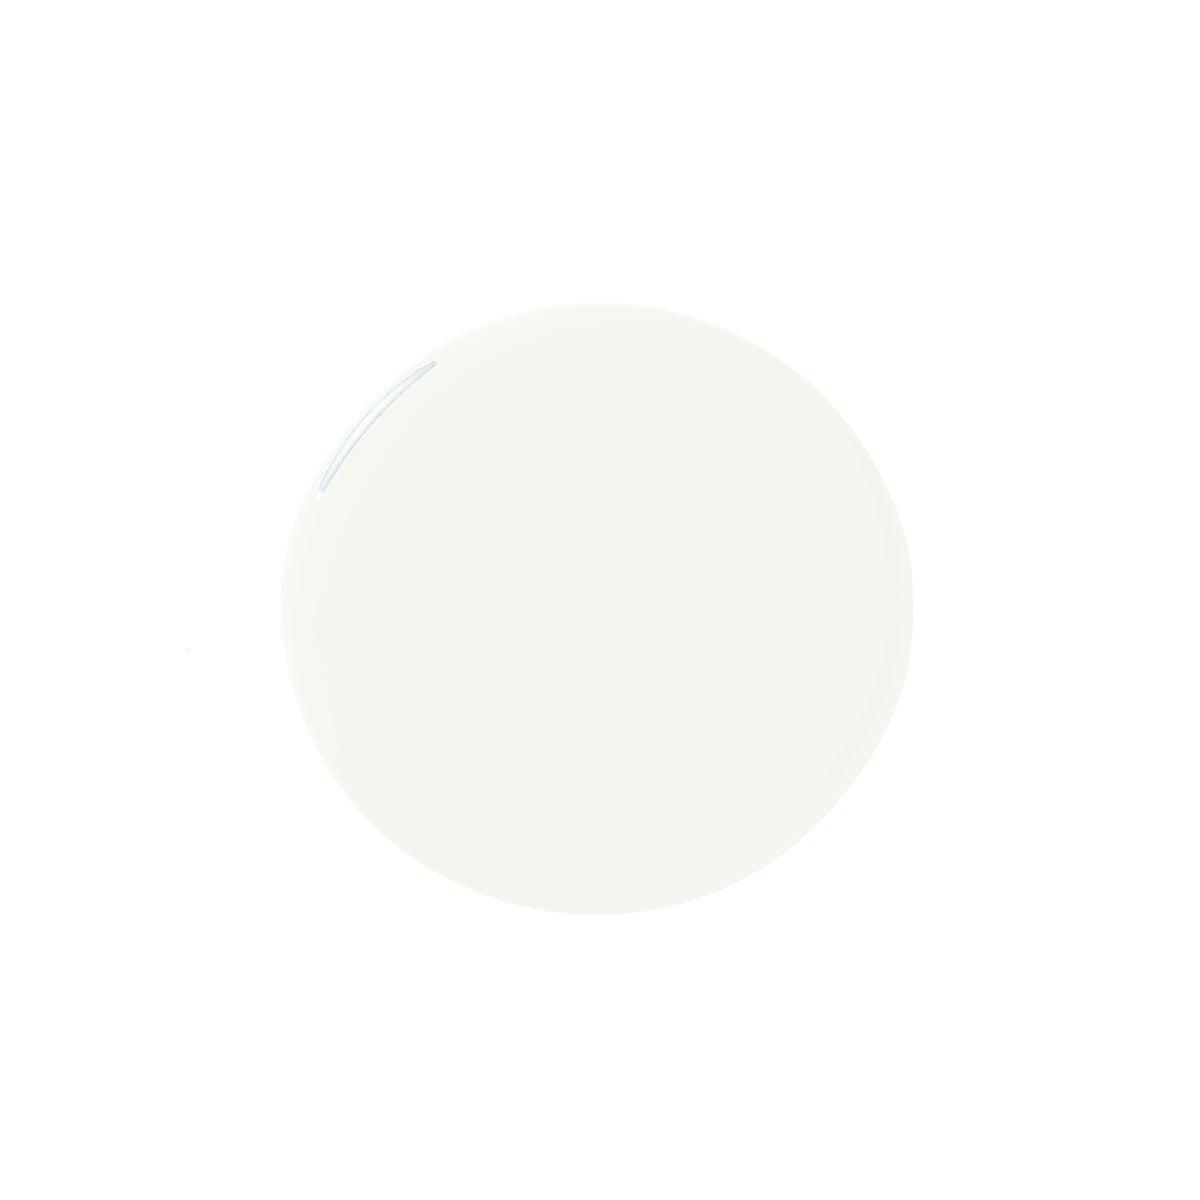 White Paint Blob